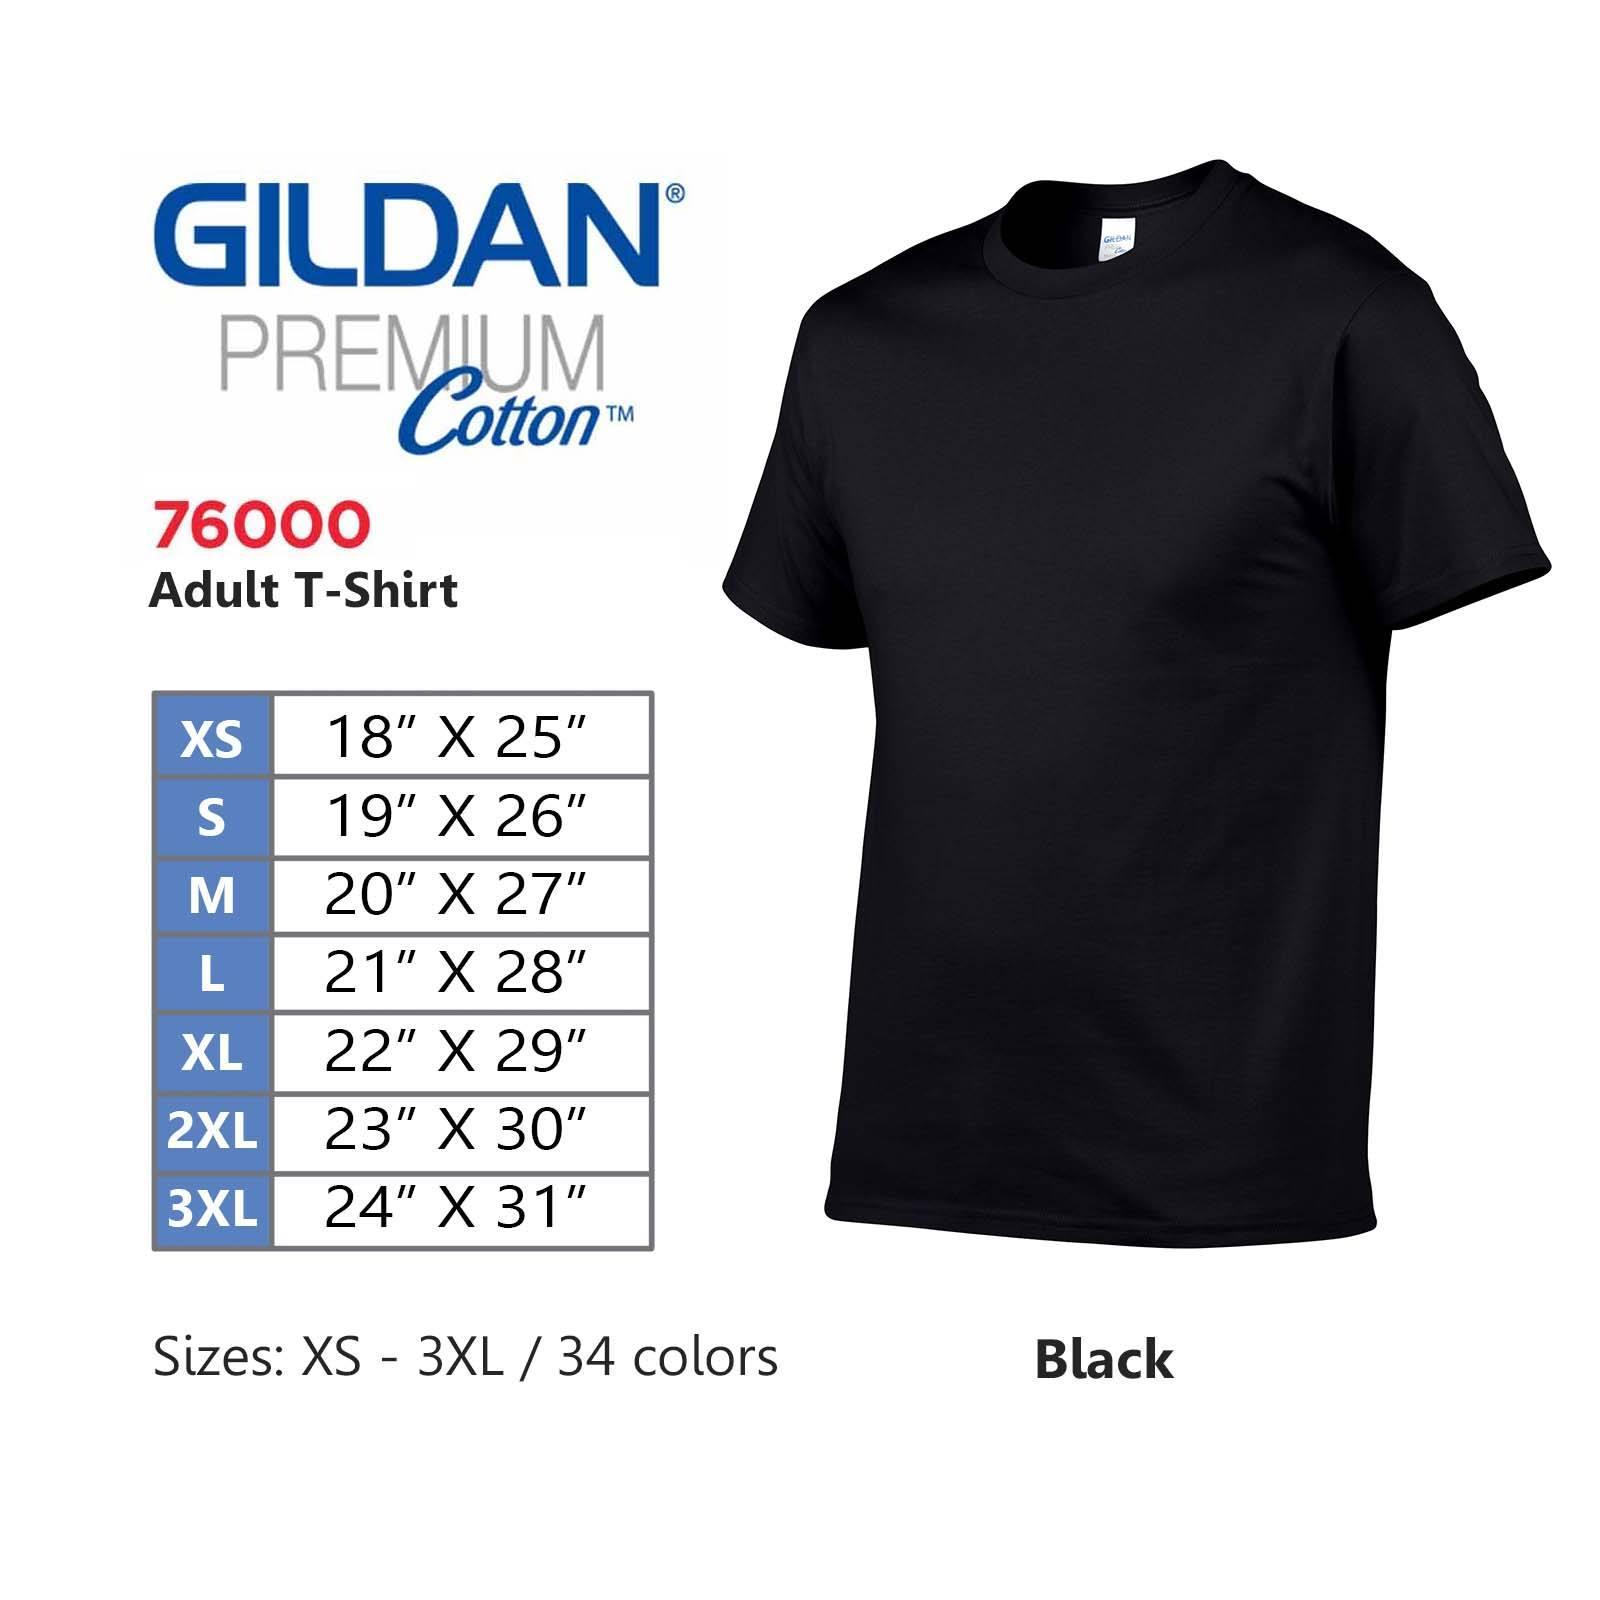 ce2cf34c20 Gildan Philippines: Gildan price list - Gildan Shirt, Hoodie & Jacket for  Men for sale | Lazada